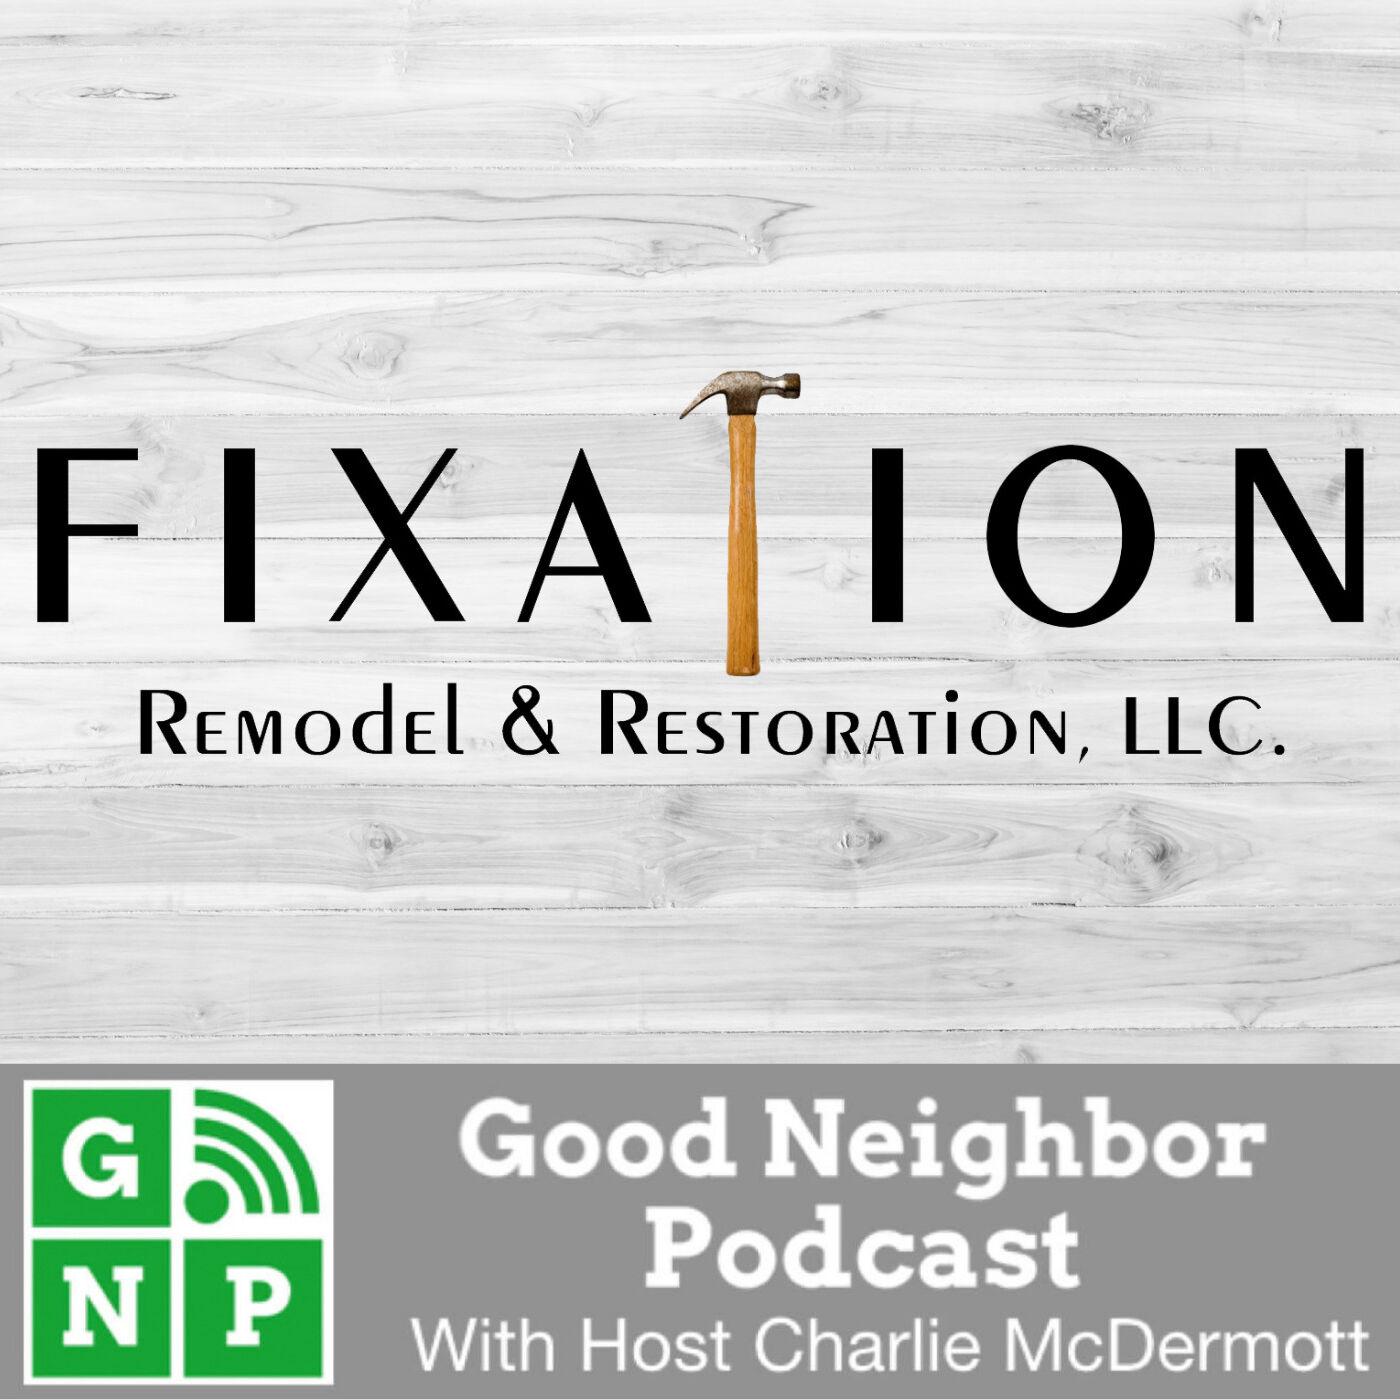 EP #517: Fixation Remodel & Restoration with David Roberts